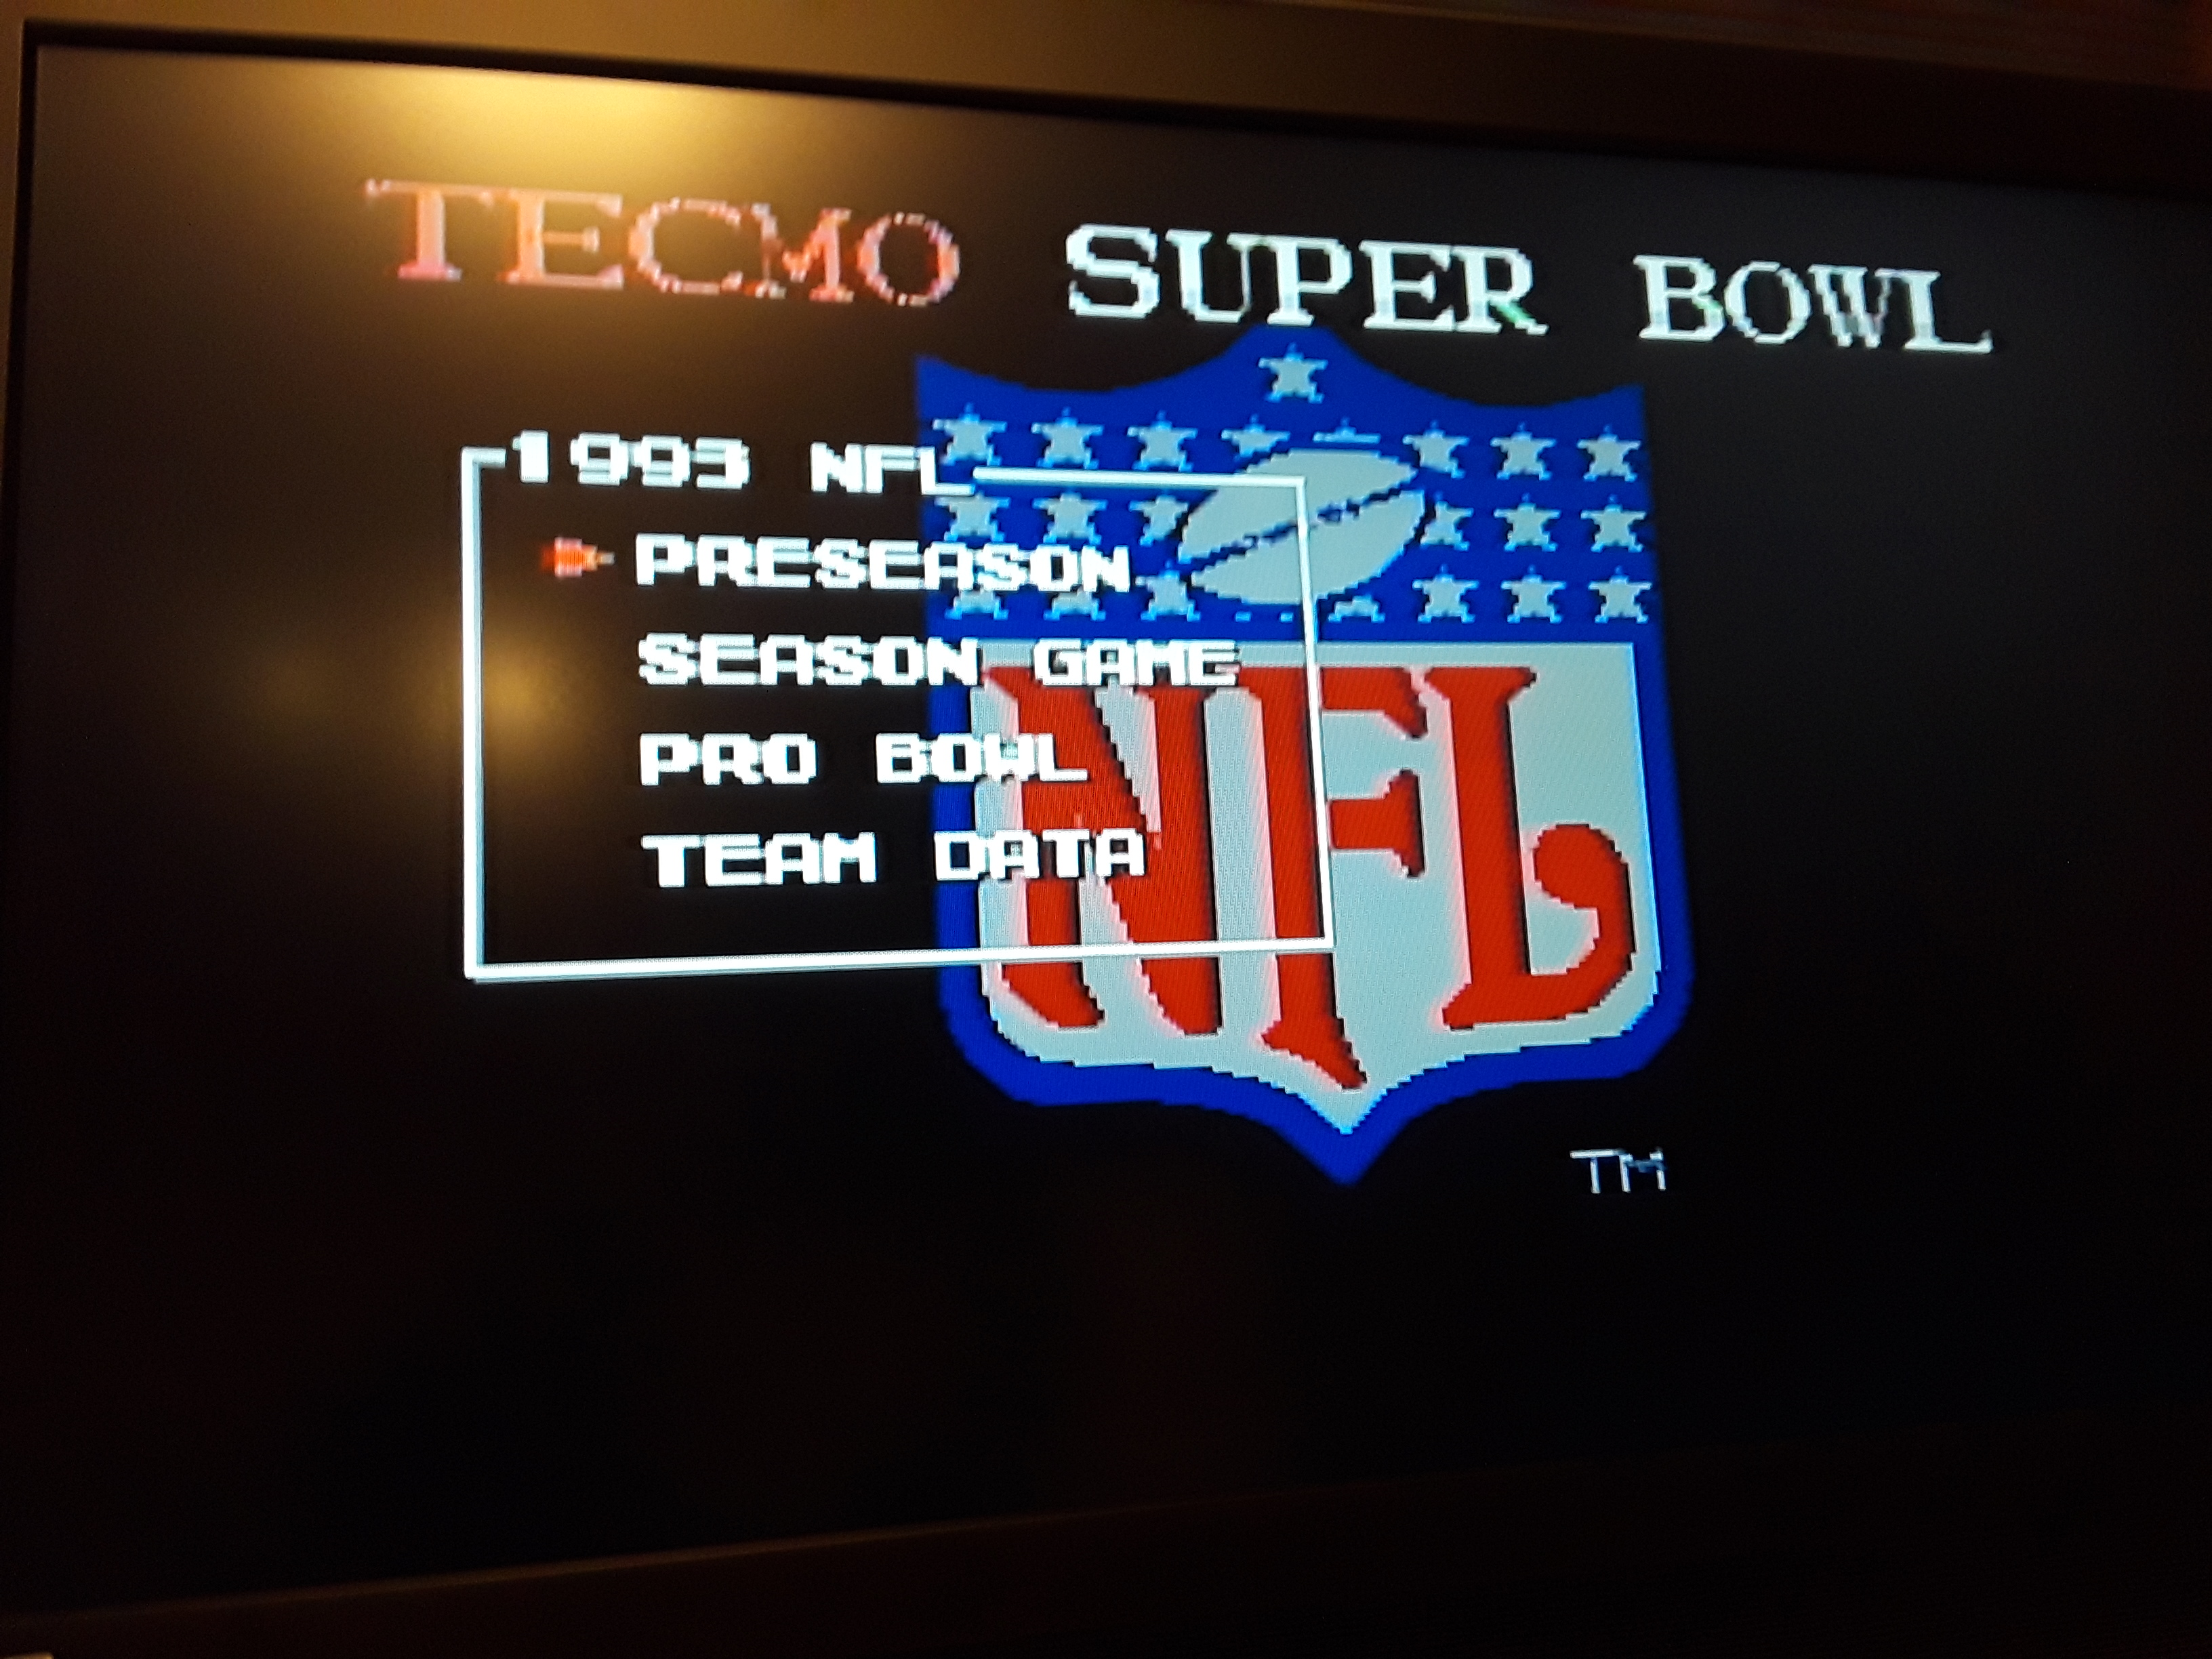 Tecmo Super Bowl [Most Passing Yards] [Preseason] 399 points